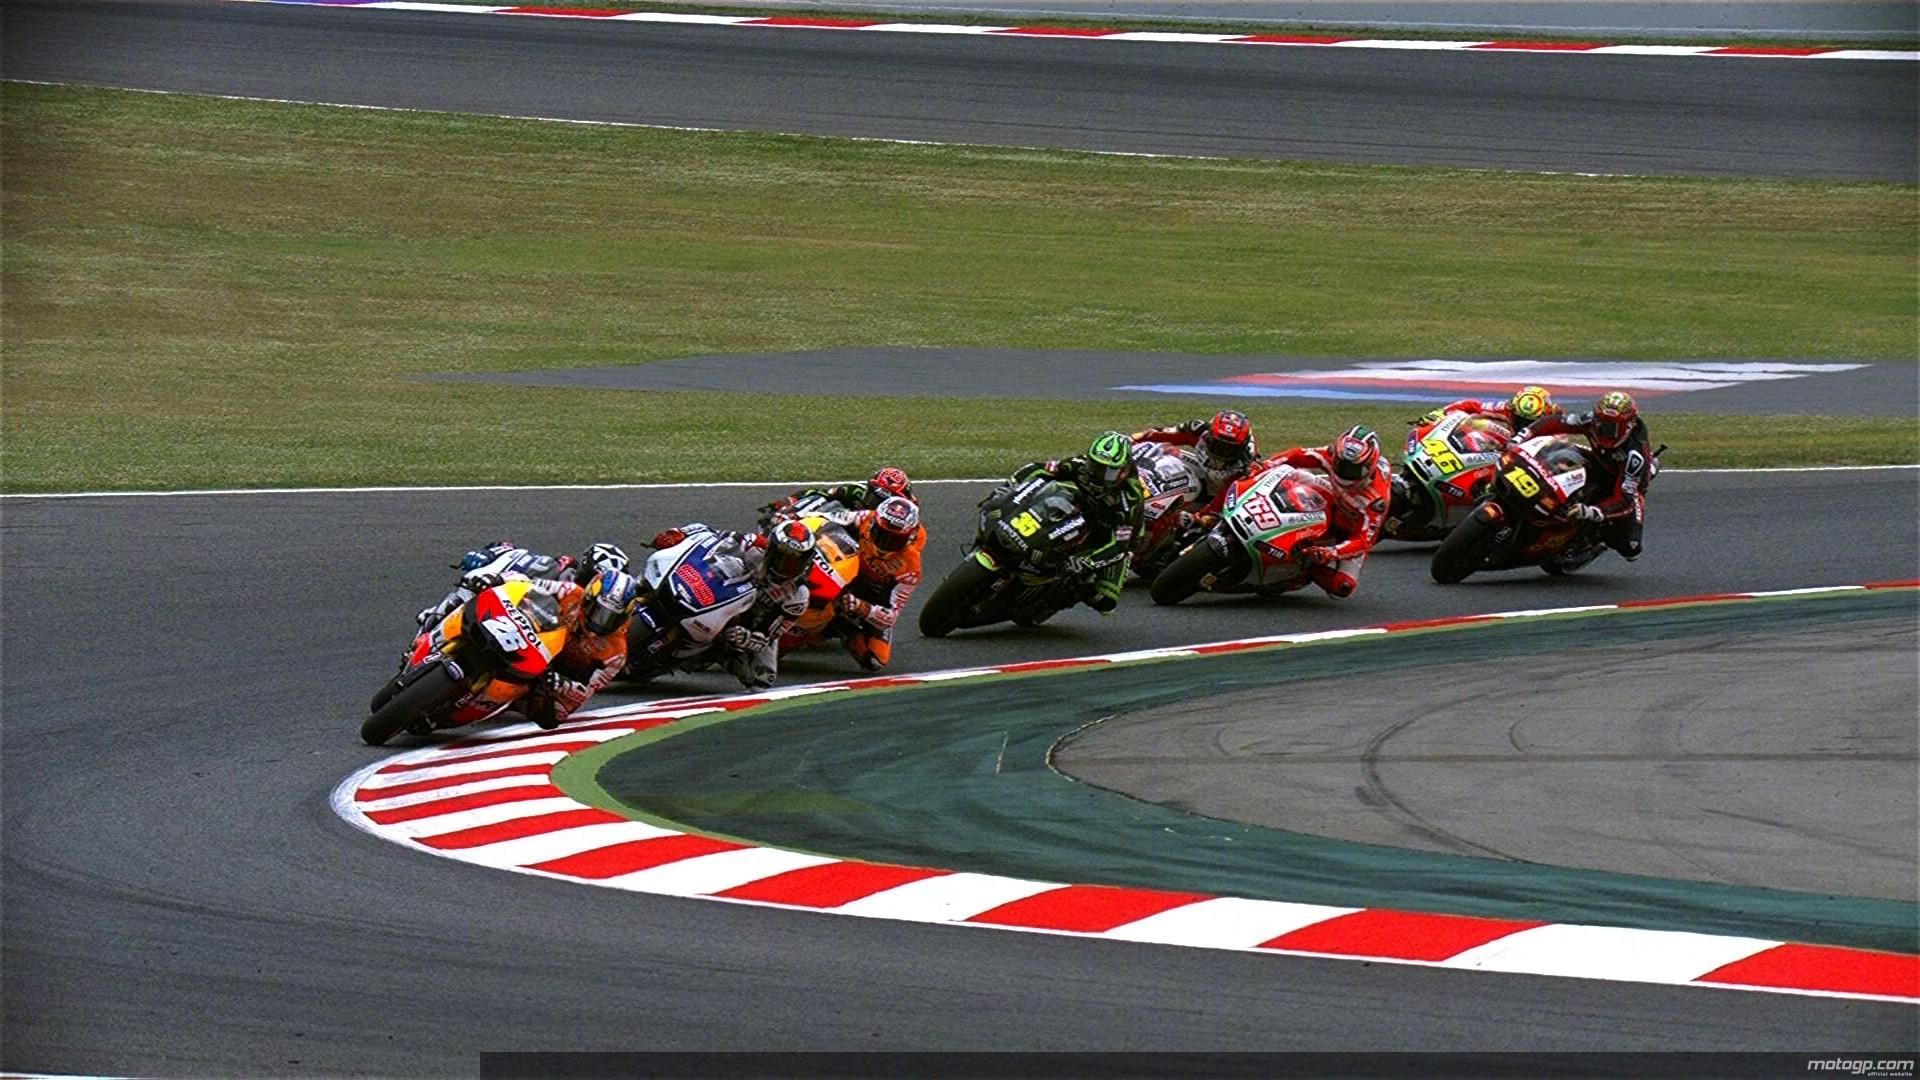 motogp.com · MotoGP Race Start